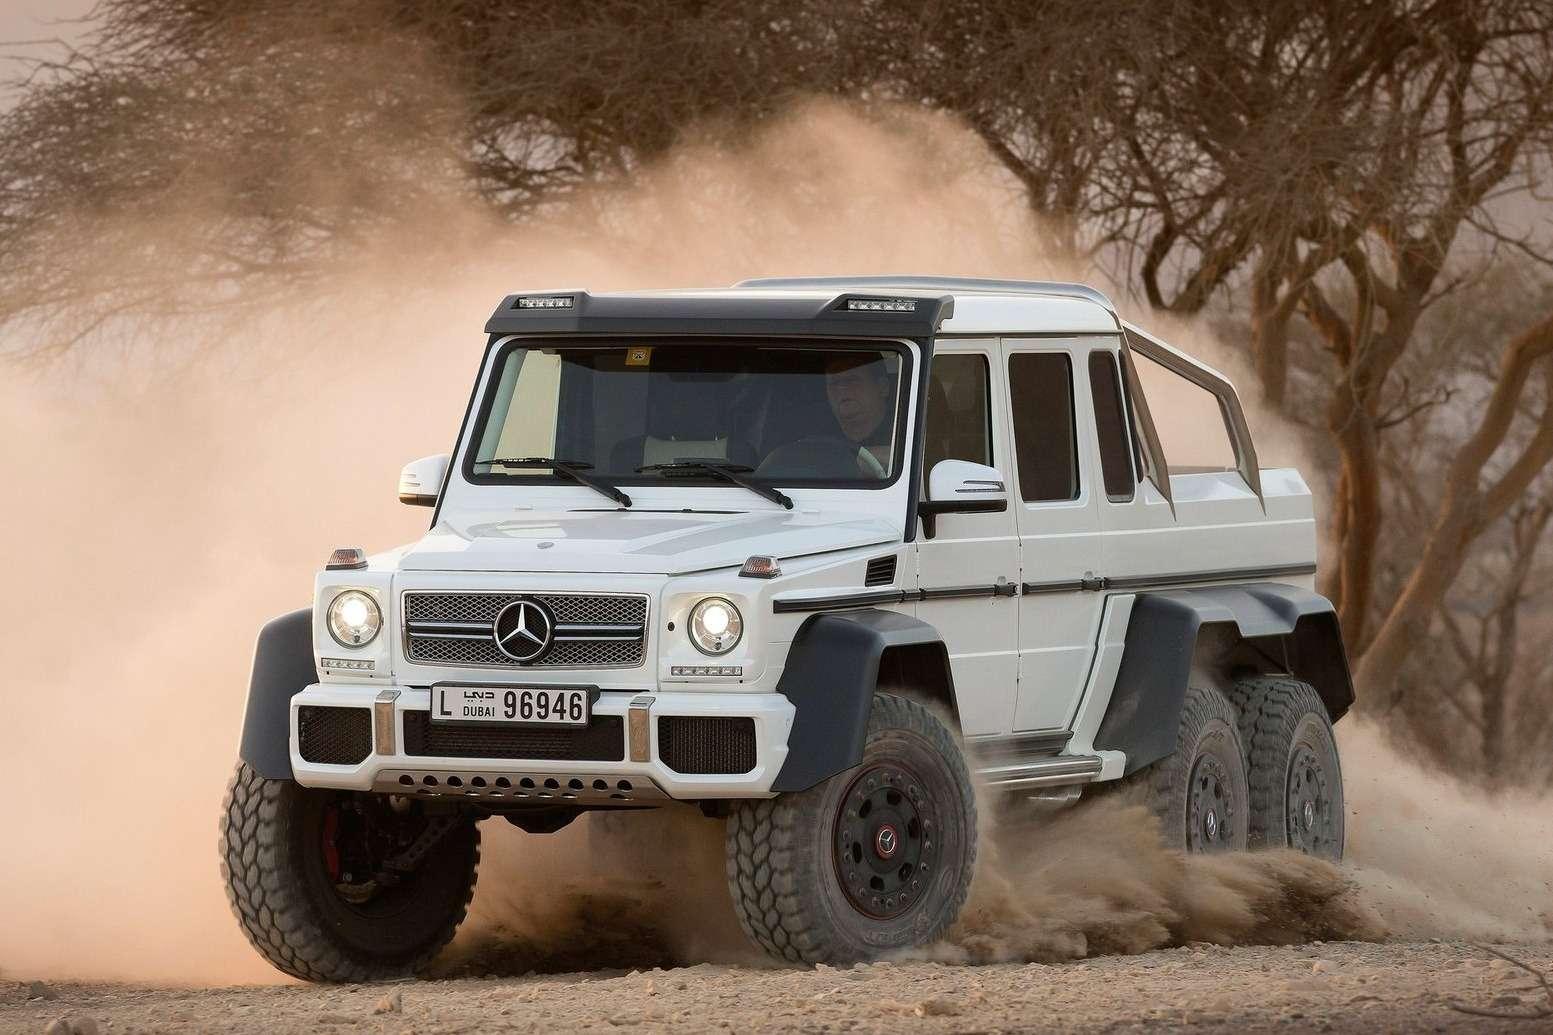 Mercedes-Benz-G63_AMG_6x6_Concept_2013_1600x1200_wallpaper_06